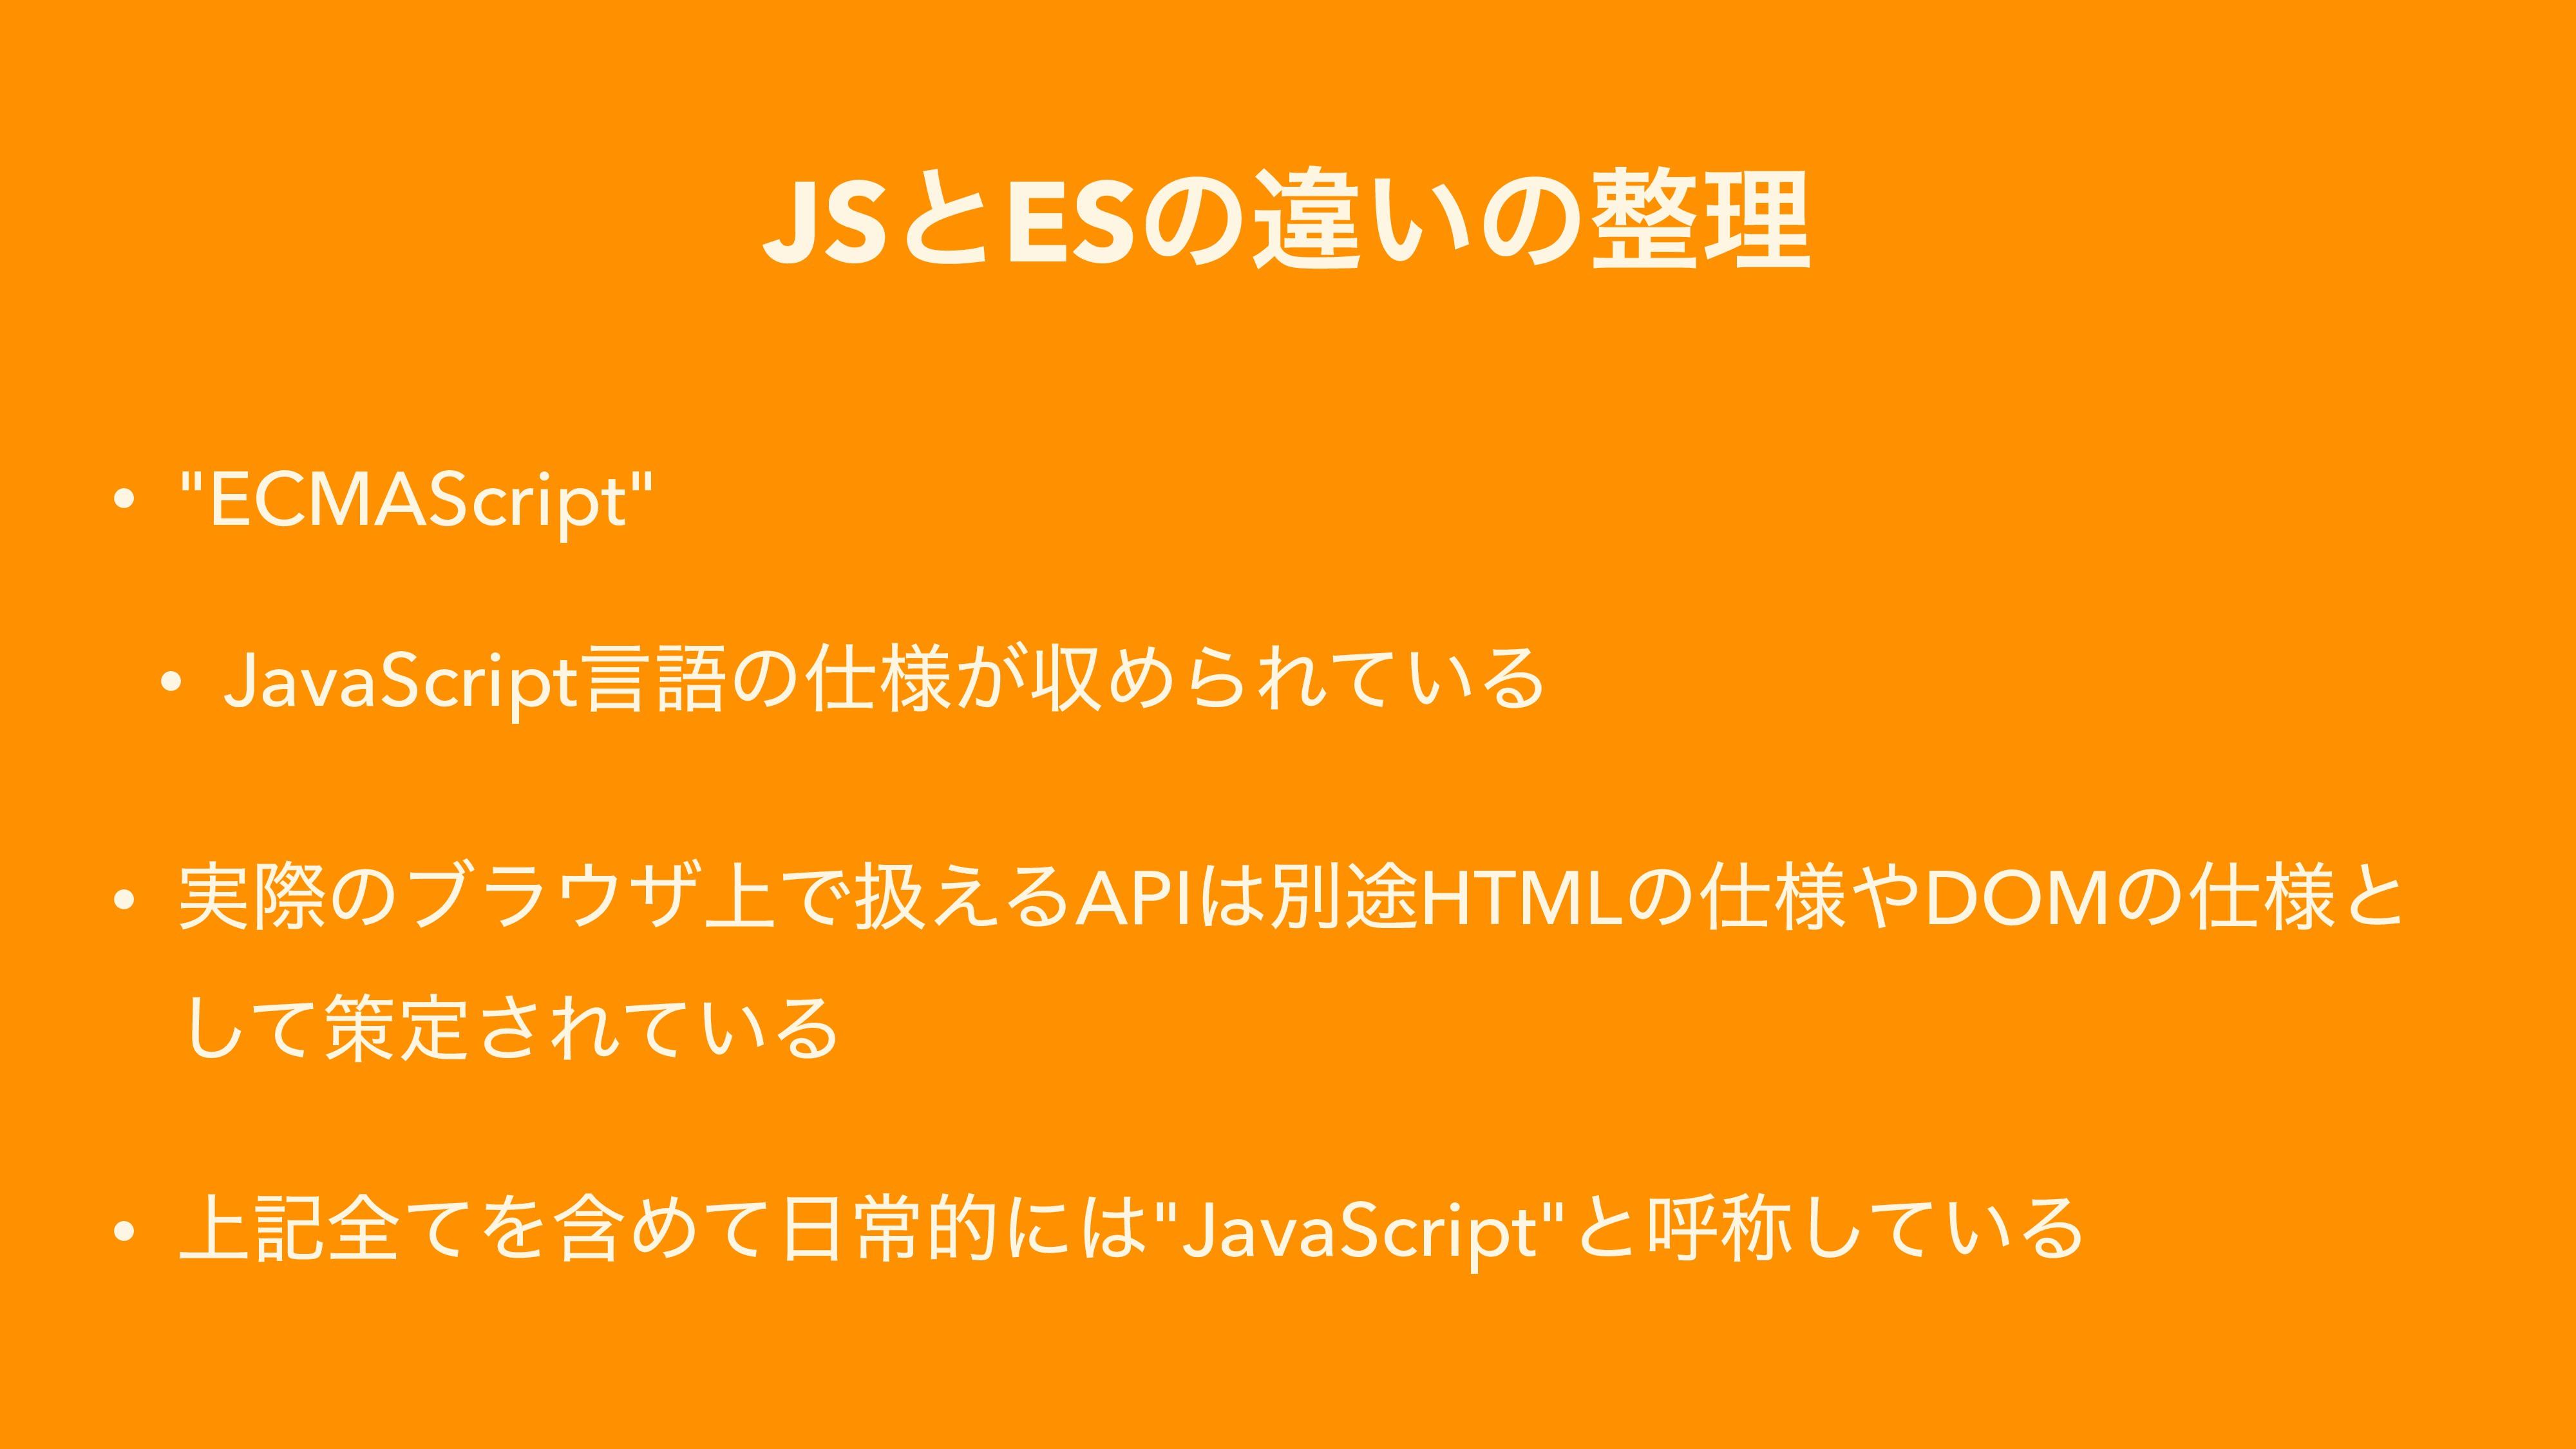 "JSͱESͷҧ͍ͷཧ • ""ECMAScript"" • JavaScriptݴޠͷ༷͕ऩΊ..."